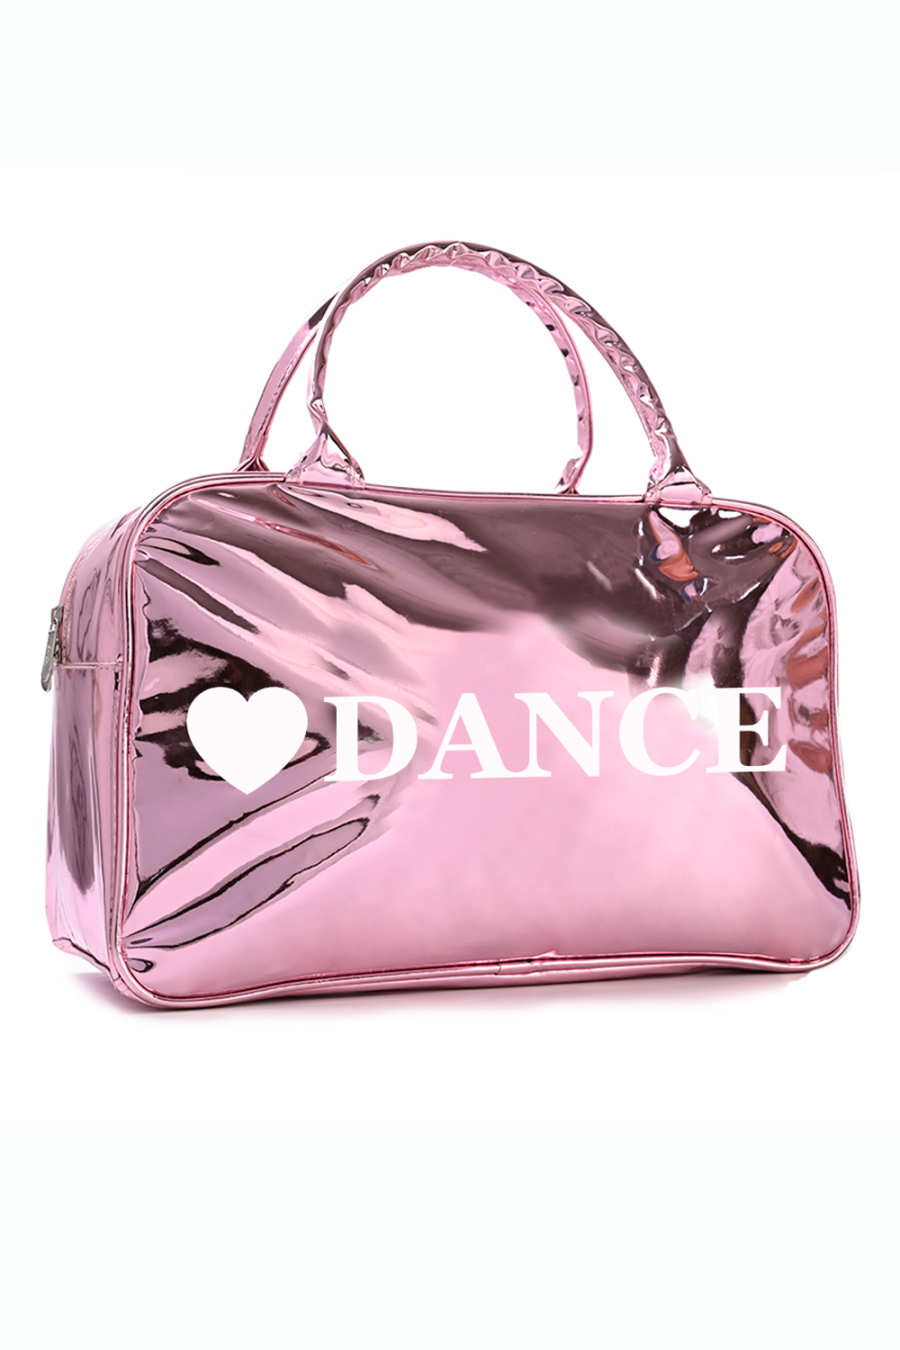 NEW RVDANCE retro style 2 handle bag Metallic pink finish